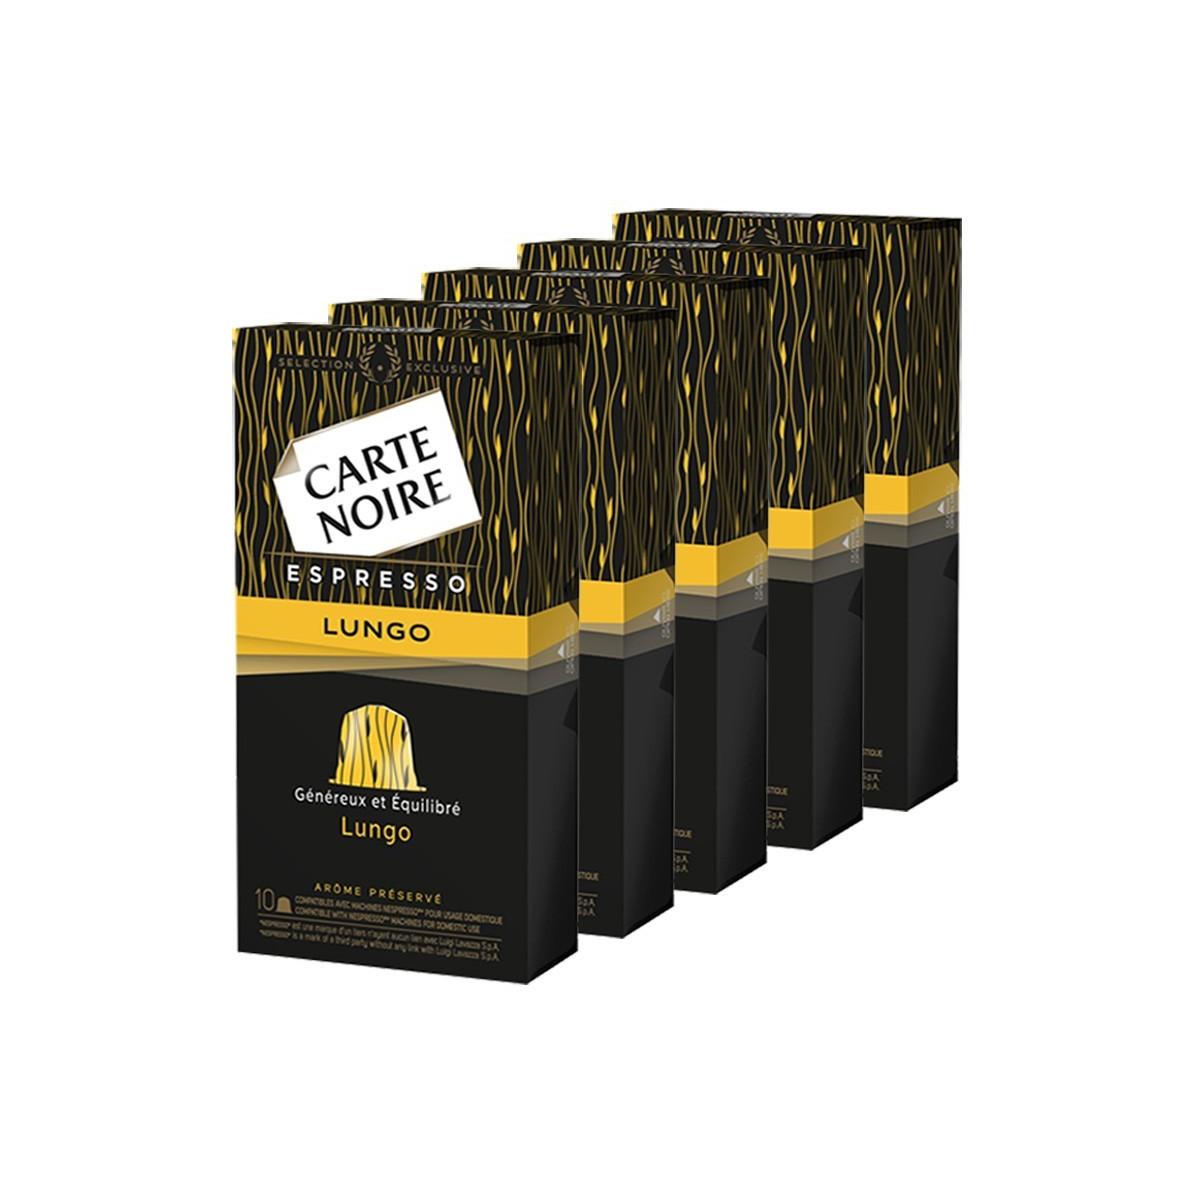 capsule nespresso compatible carte noire n 8 caf lungo fortissime 50 capsules. Black Bedroom Furniture Sets. Home Design Ideas